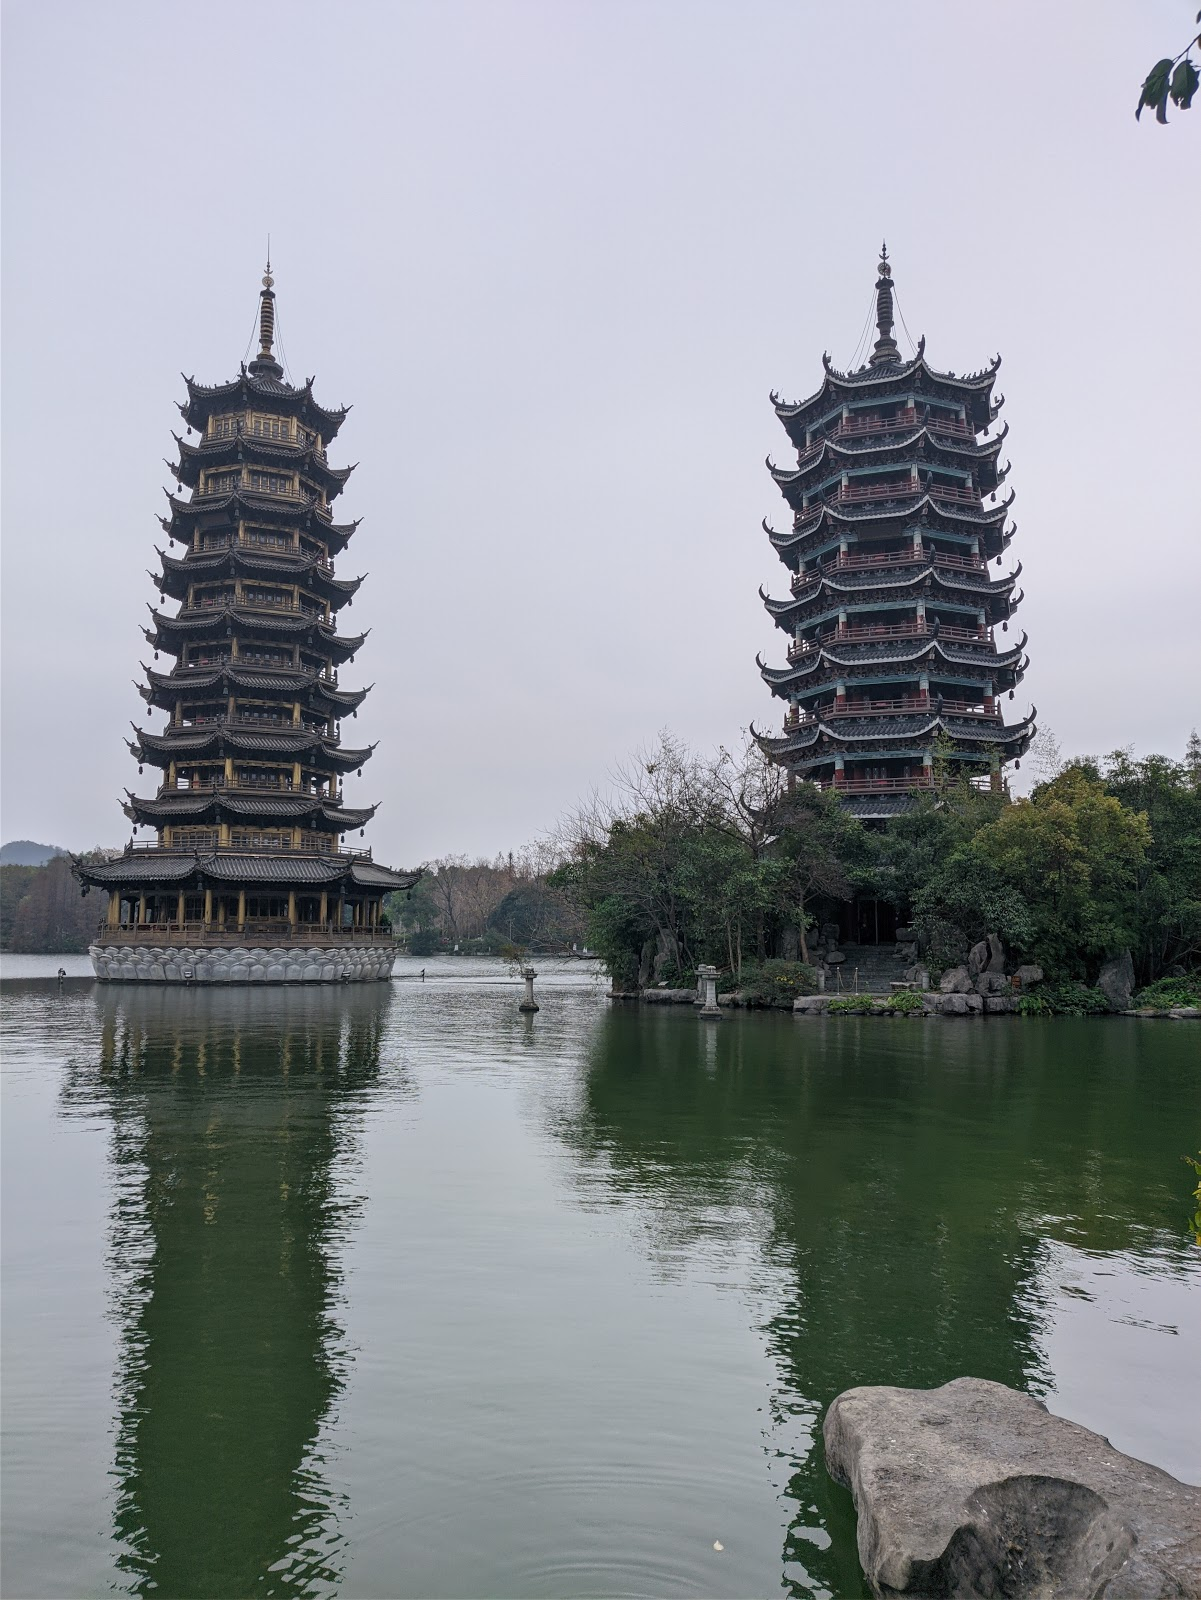 Jingjiang Princes' Palace